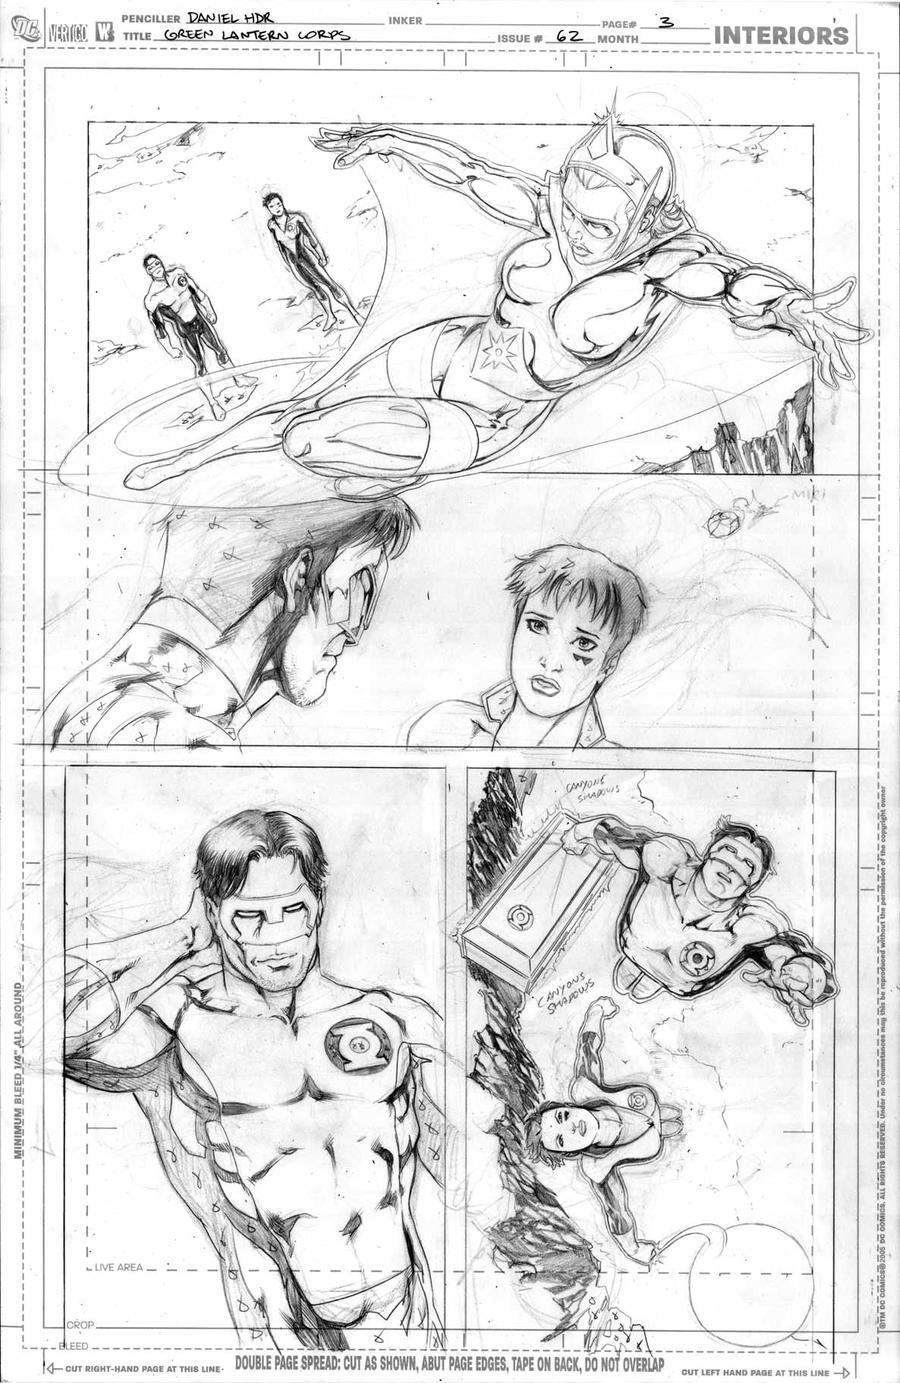 Green Lantern Corps 62 pg03 by danielhdr